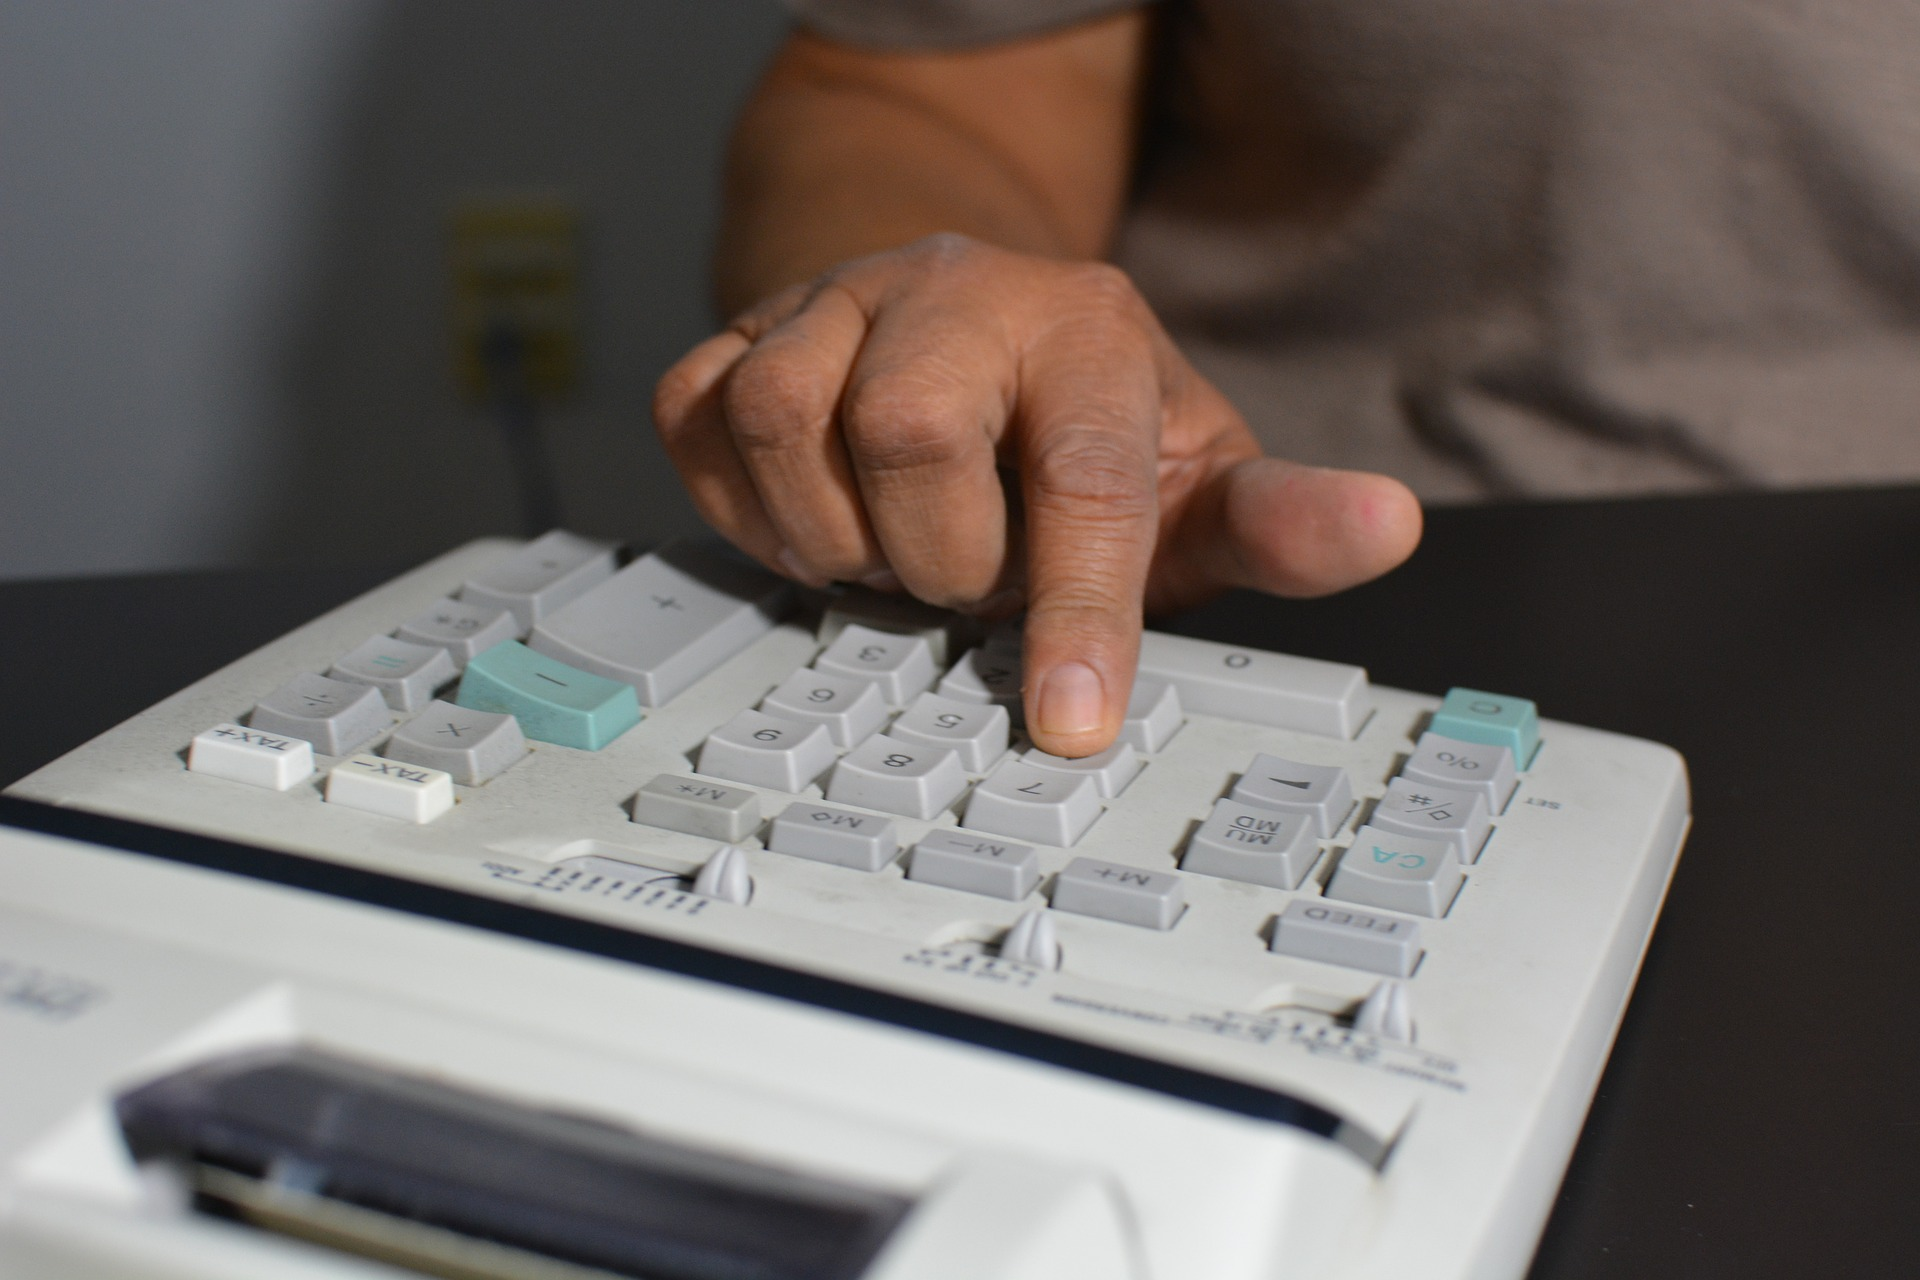 accounting-806393_1920.jpg